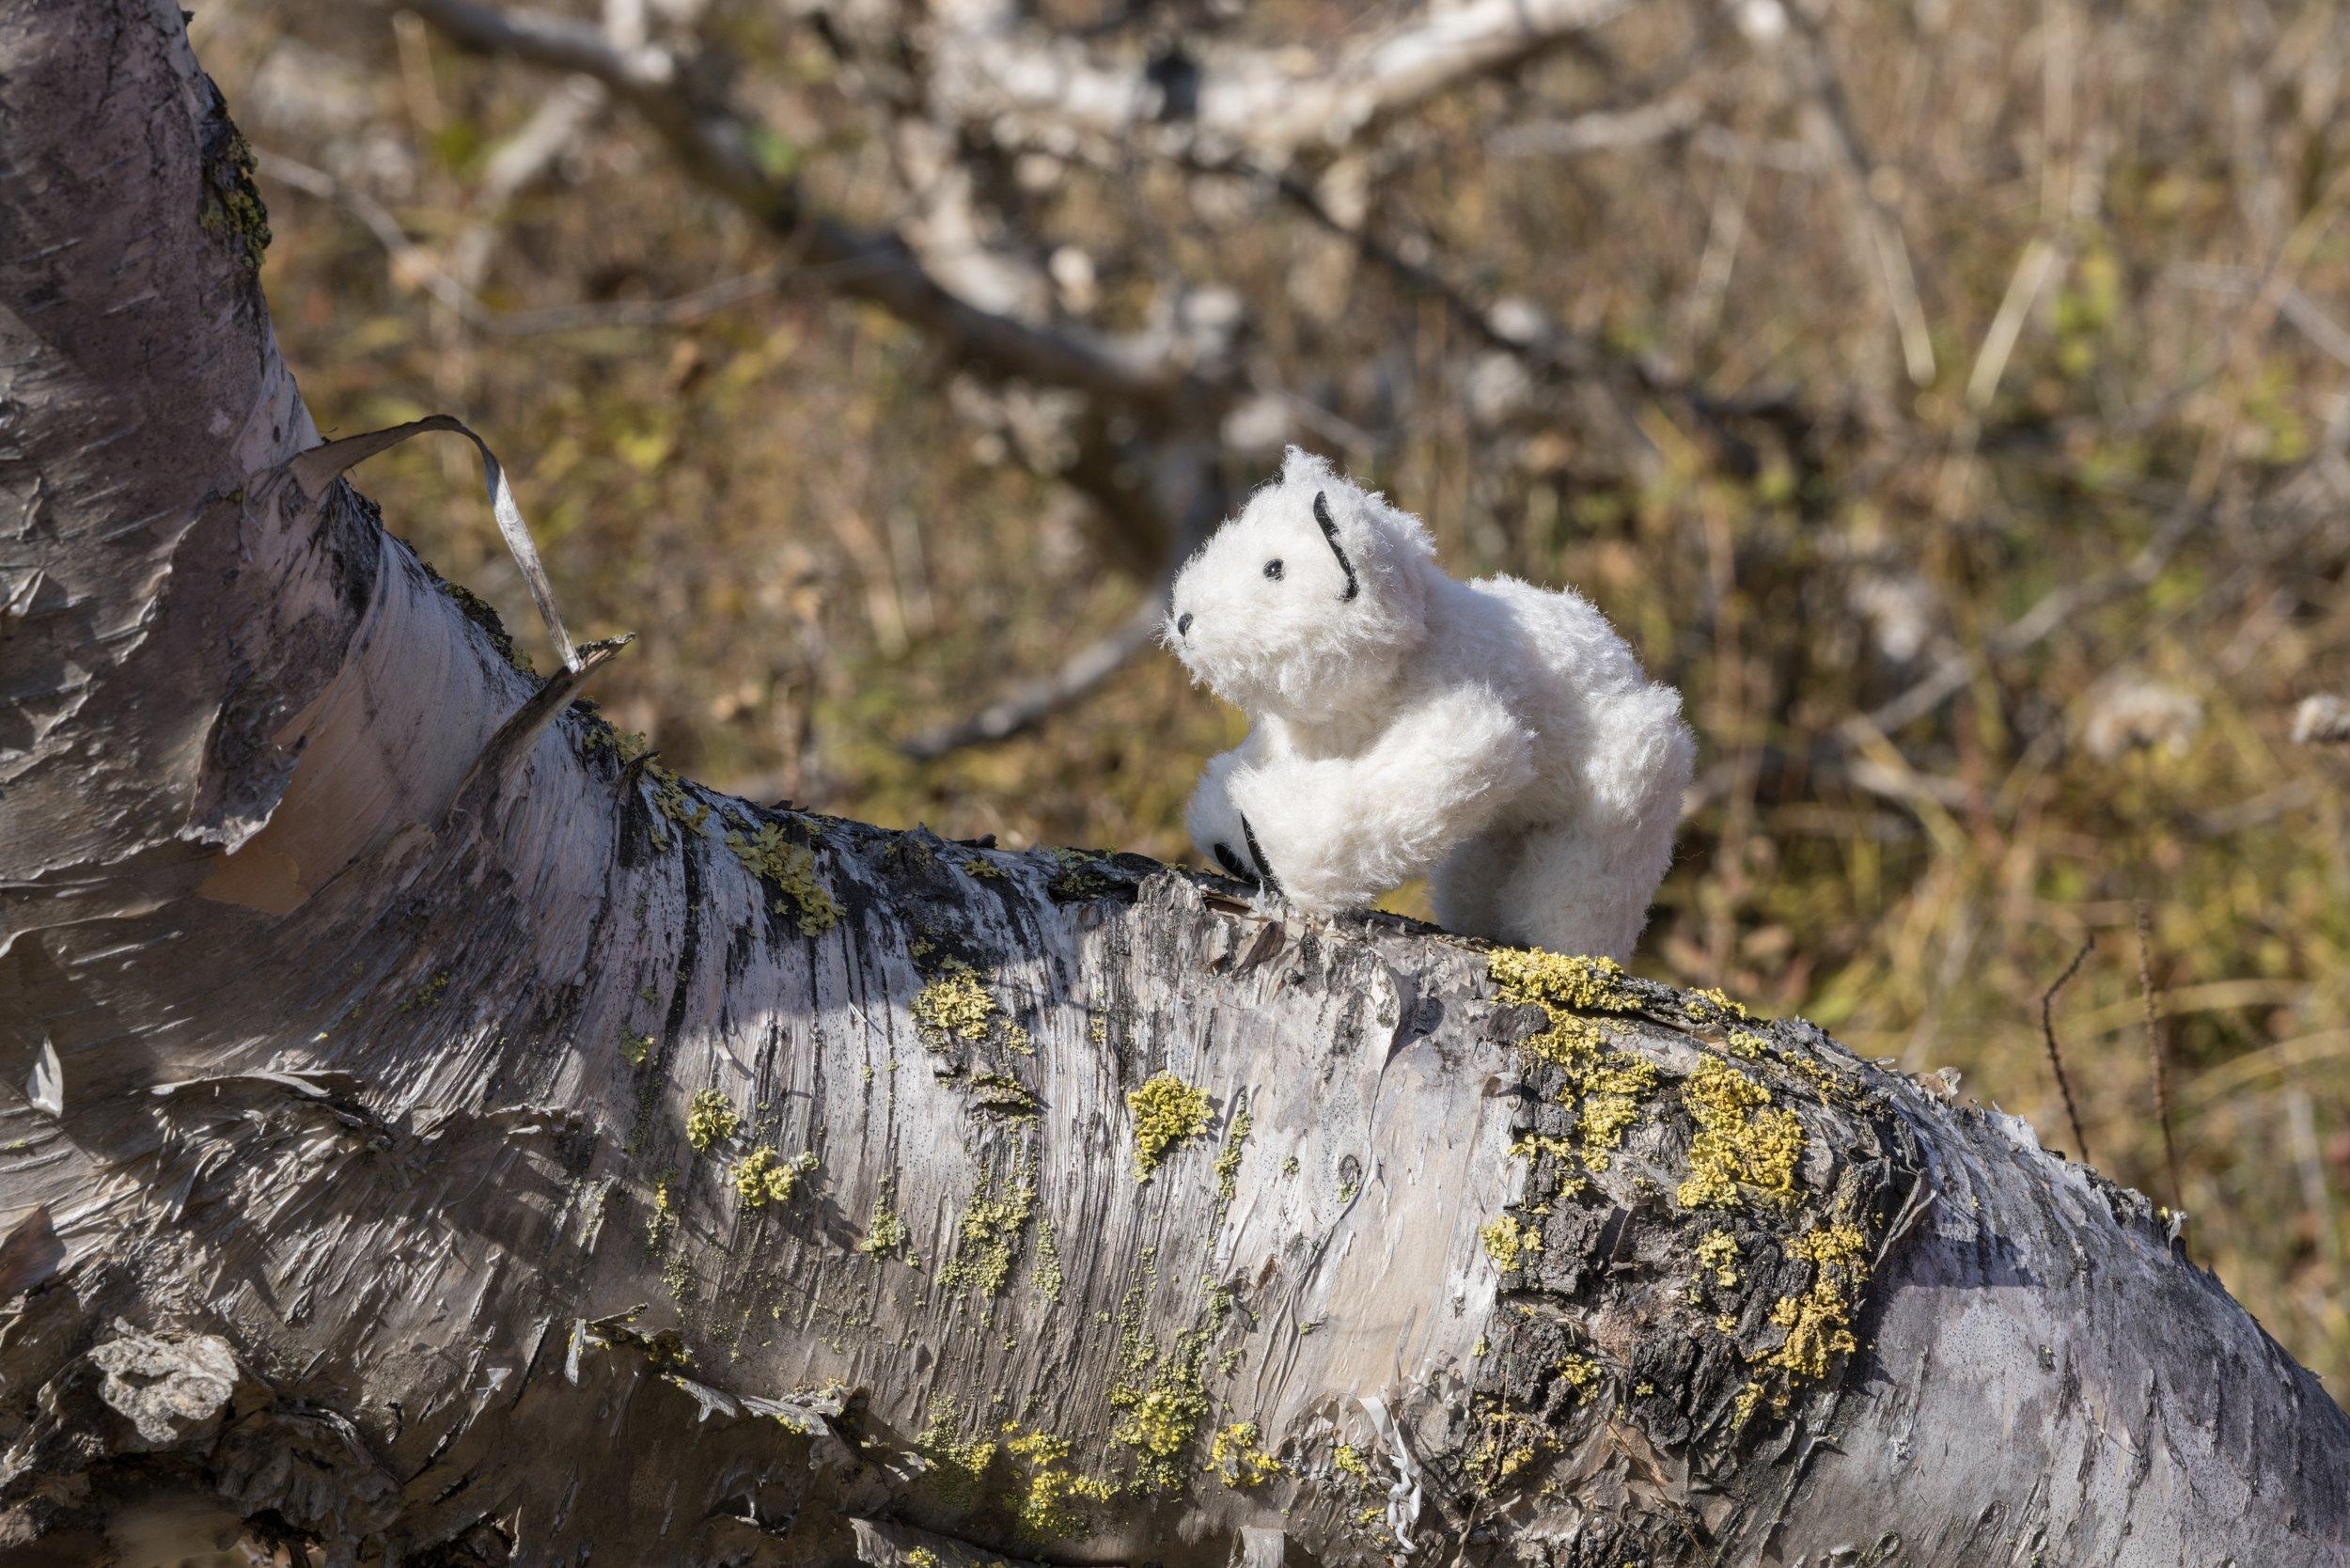 53°2'N | 158°38'E ● Nalychevo Nature Park | Russia